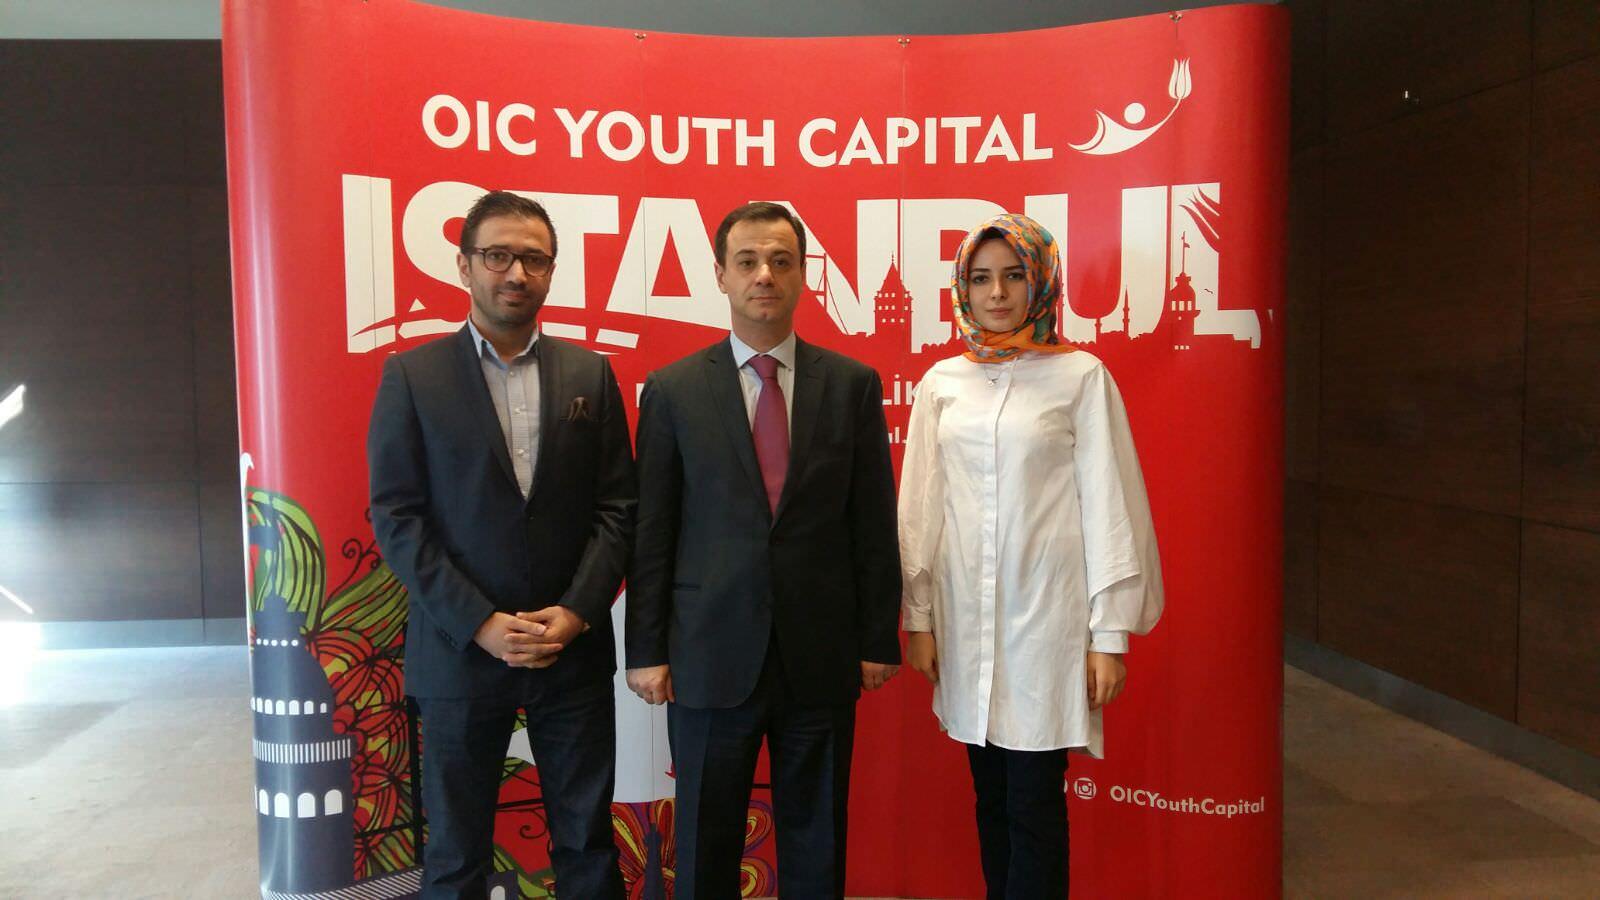 Daily Sabah's Mehmet Çelik (L) and Esra Biçer (Right) with Ambassador Elshad Iskandarov